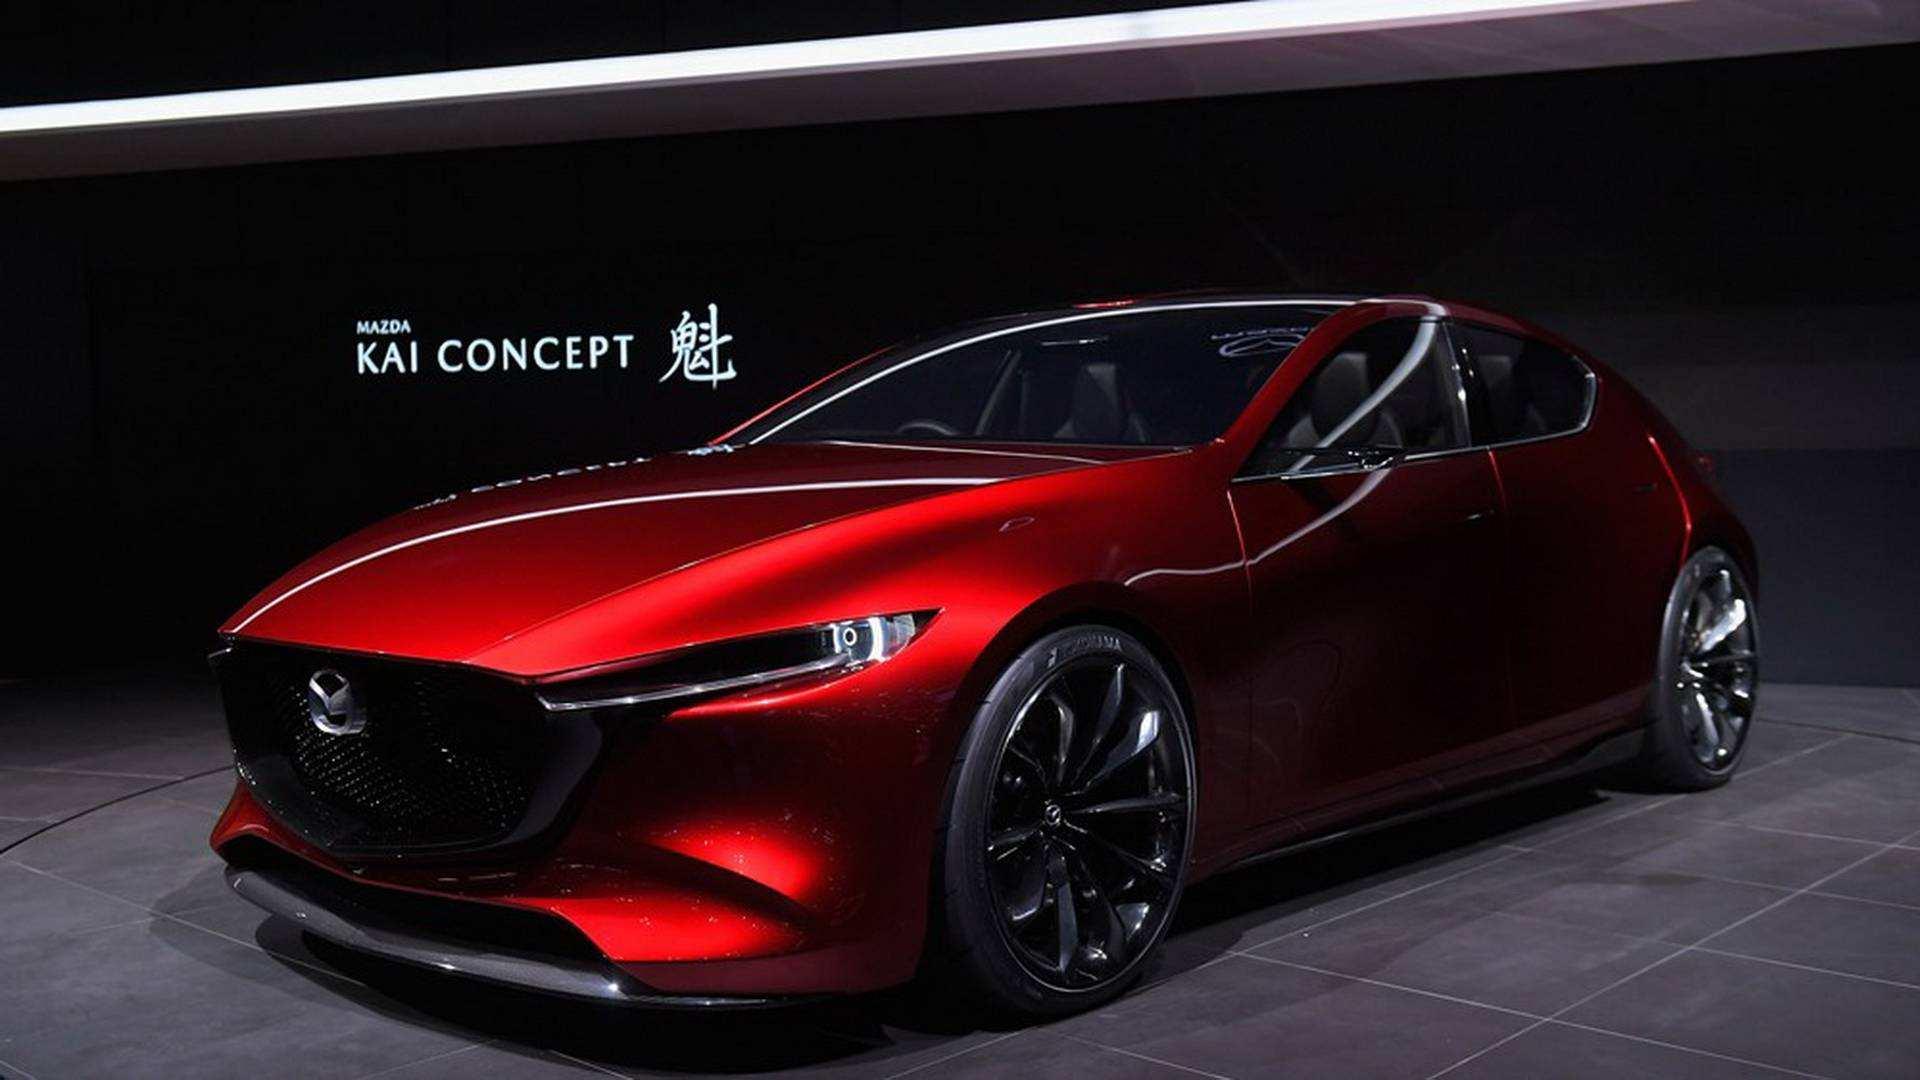 36 New Mazda Kai 2019 Performance and New Engine with Mazda Kai 2019